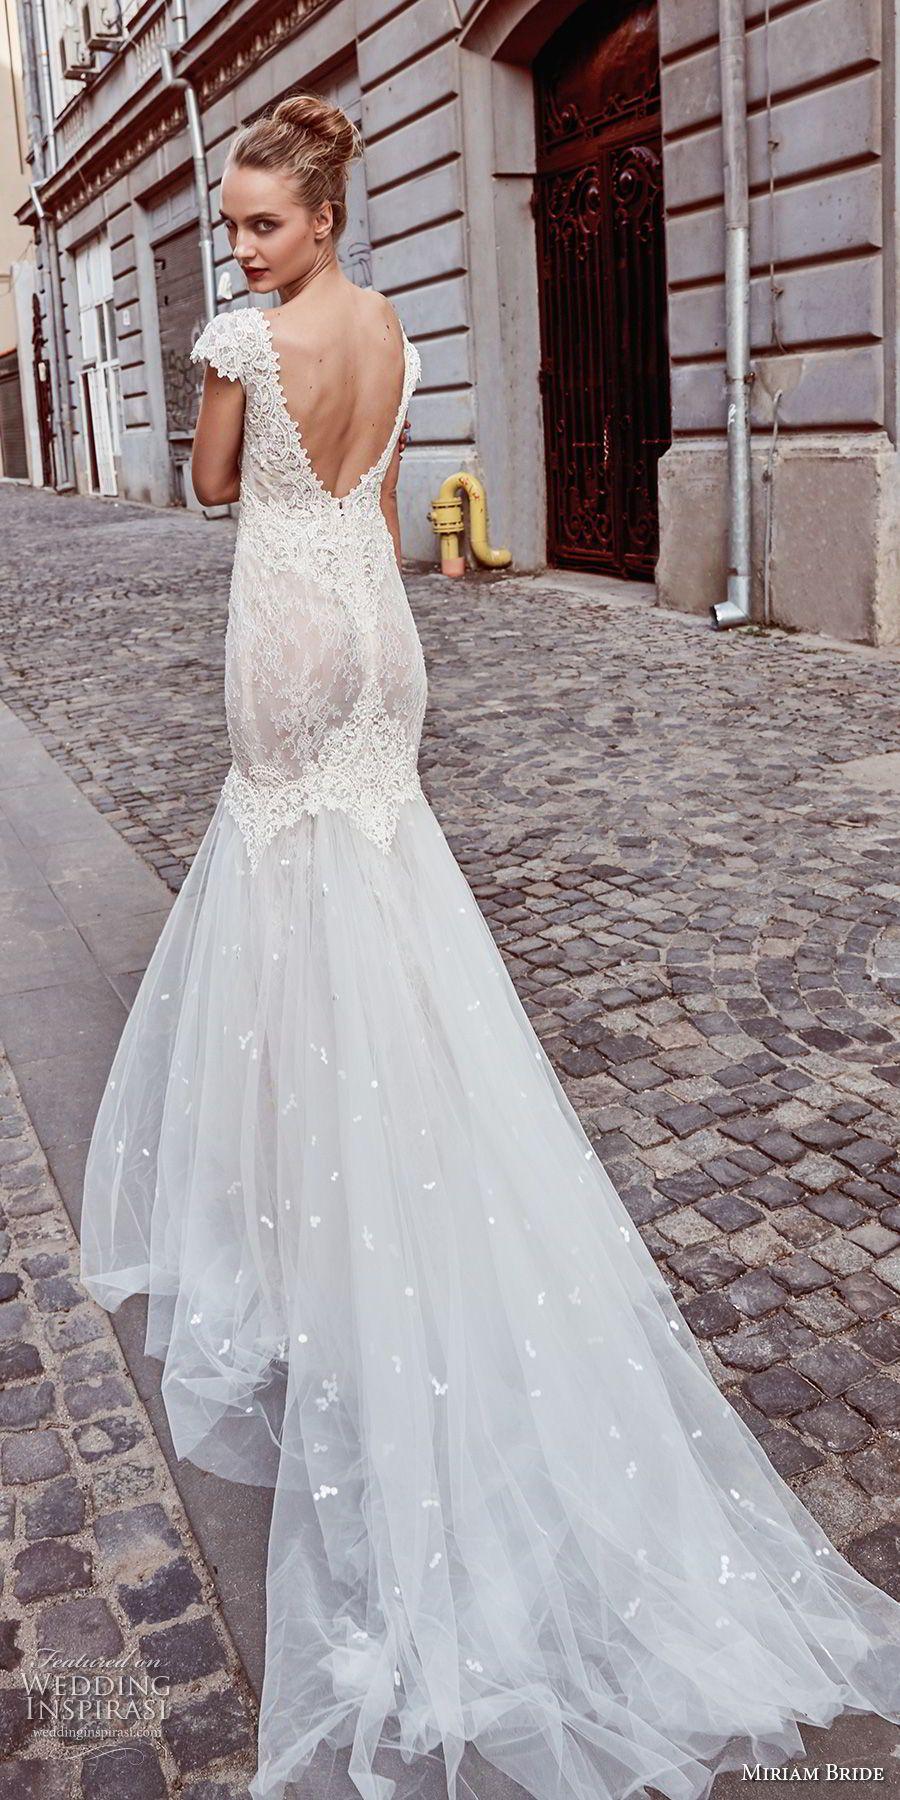 Miriams Bride 2018 Wedding Dresses   Bateau neckline, Mermaid ...